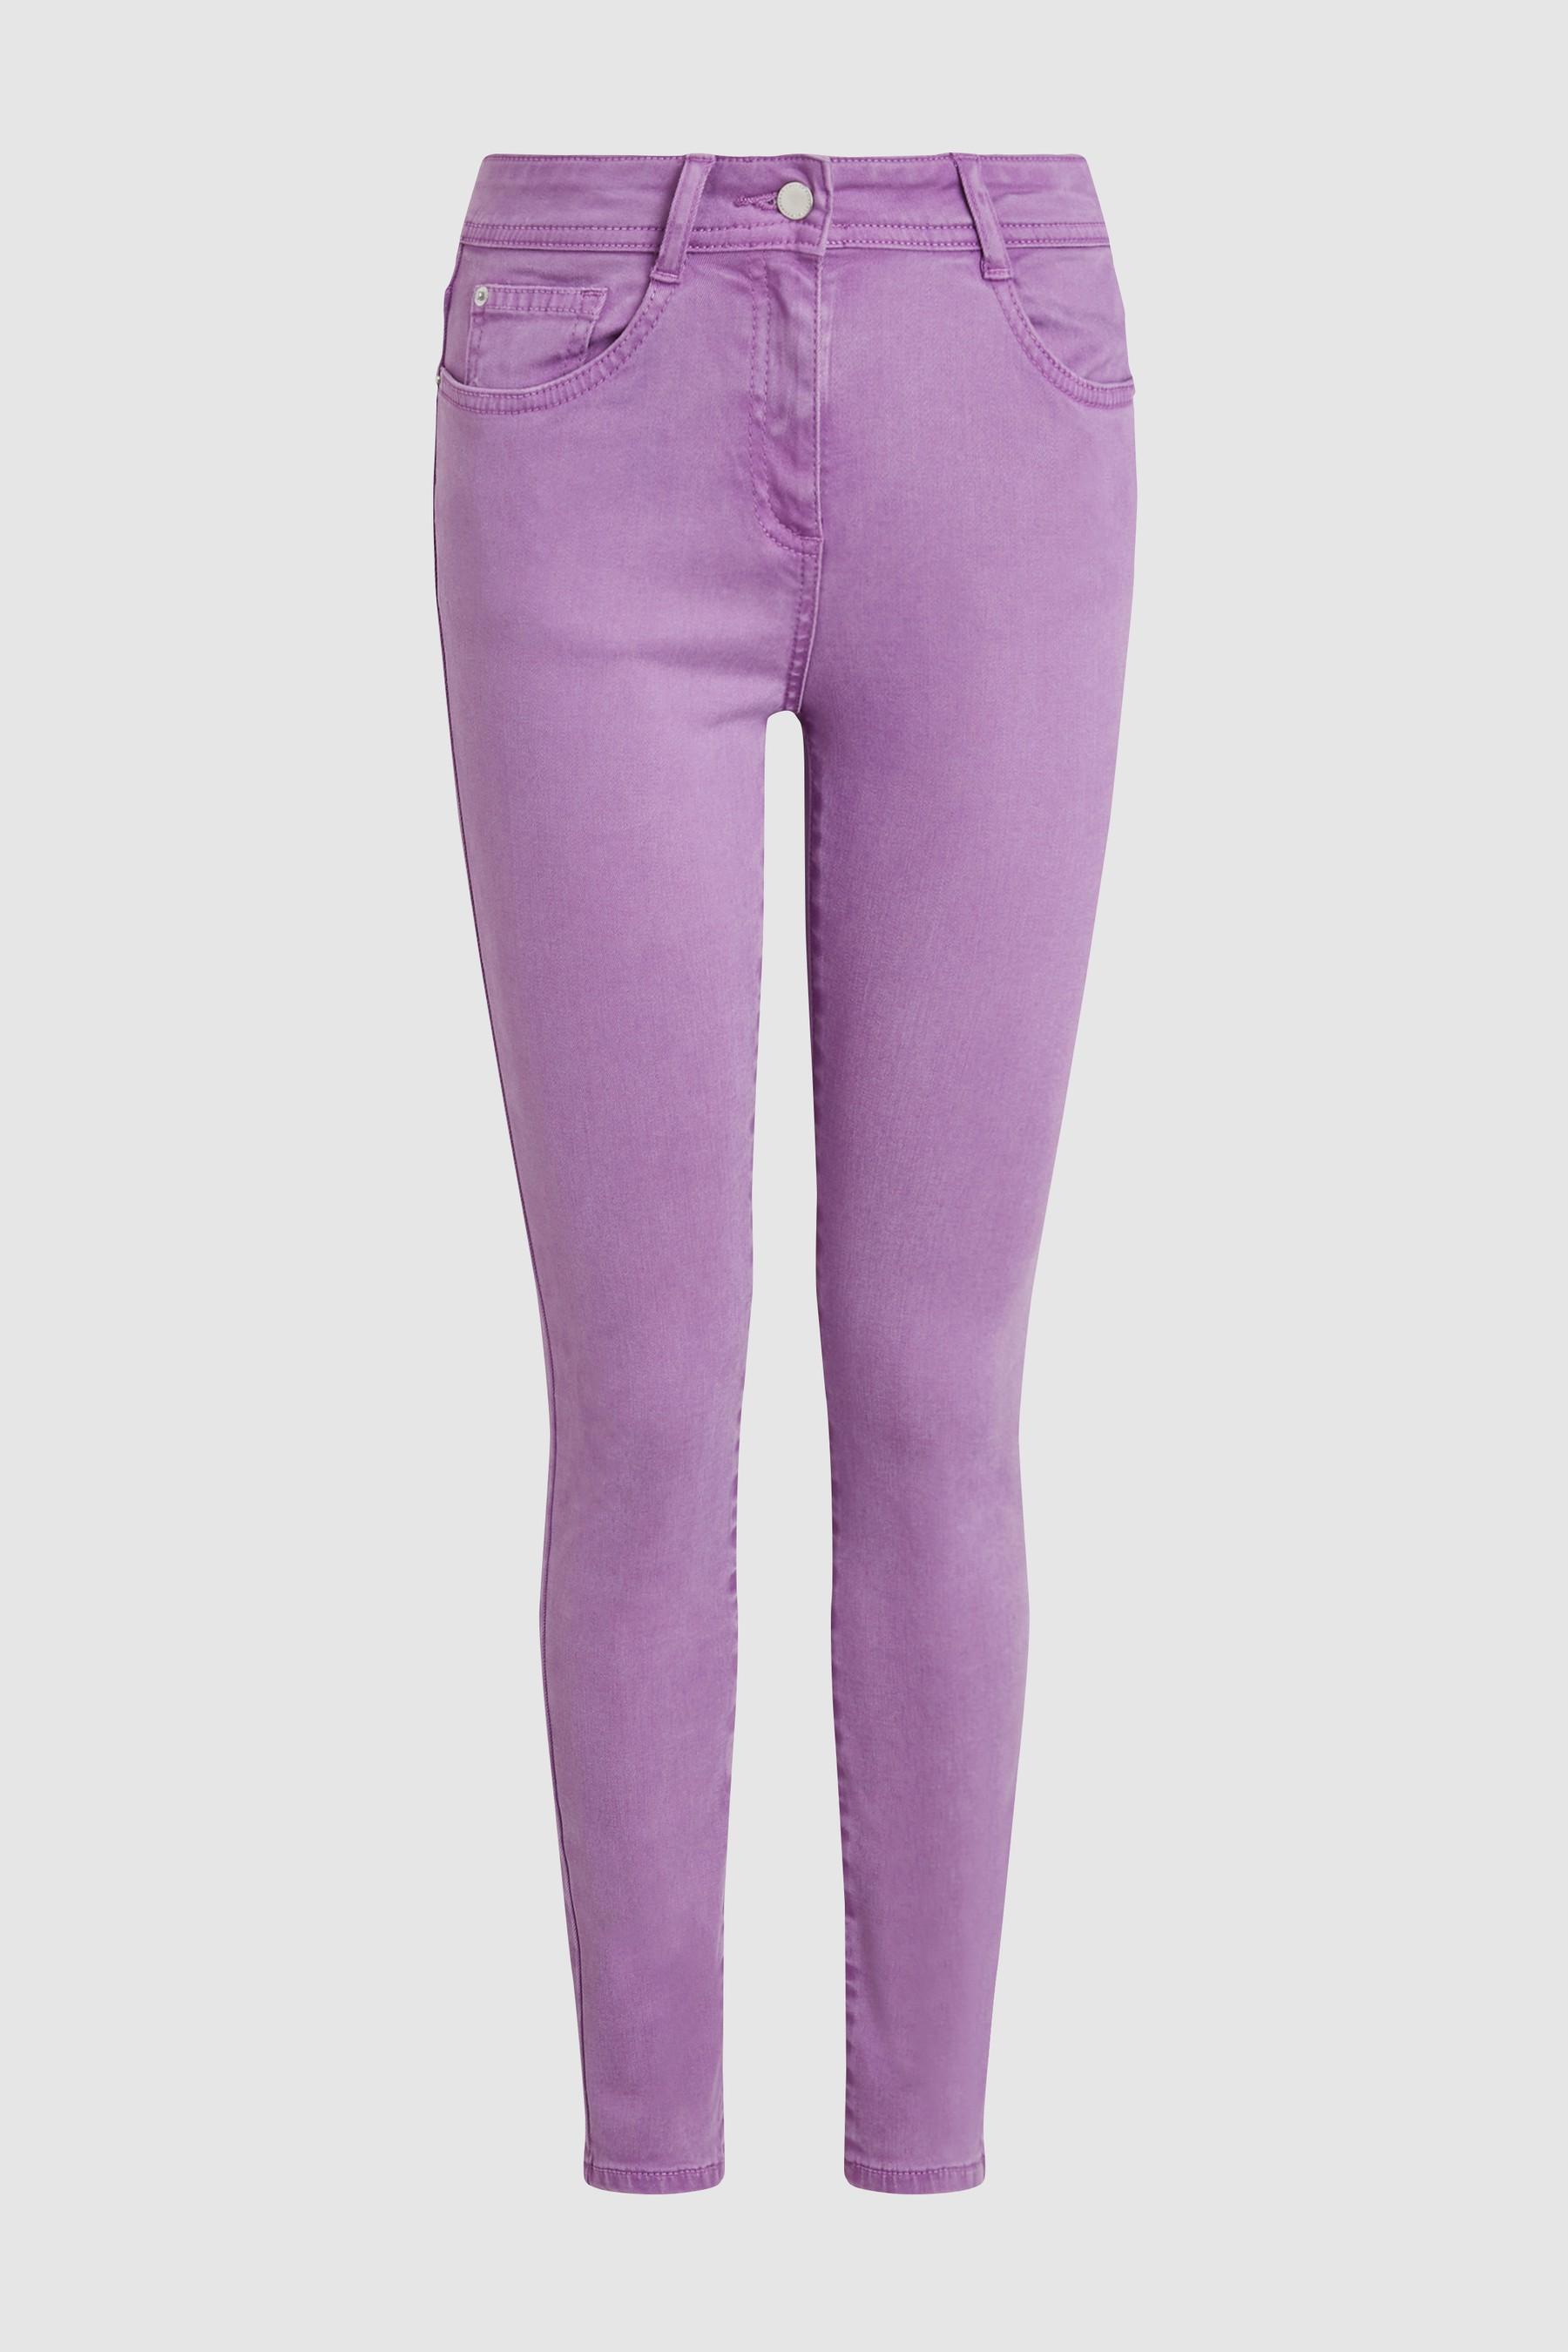 09d2f9e40 Womens Next Bright Purple Soft Touch Skinny Jeans - Purple ...